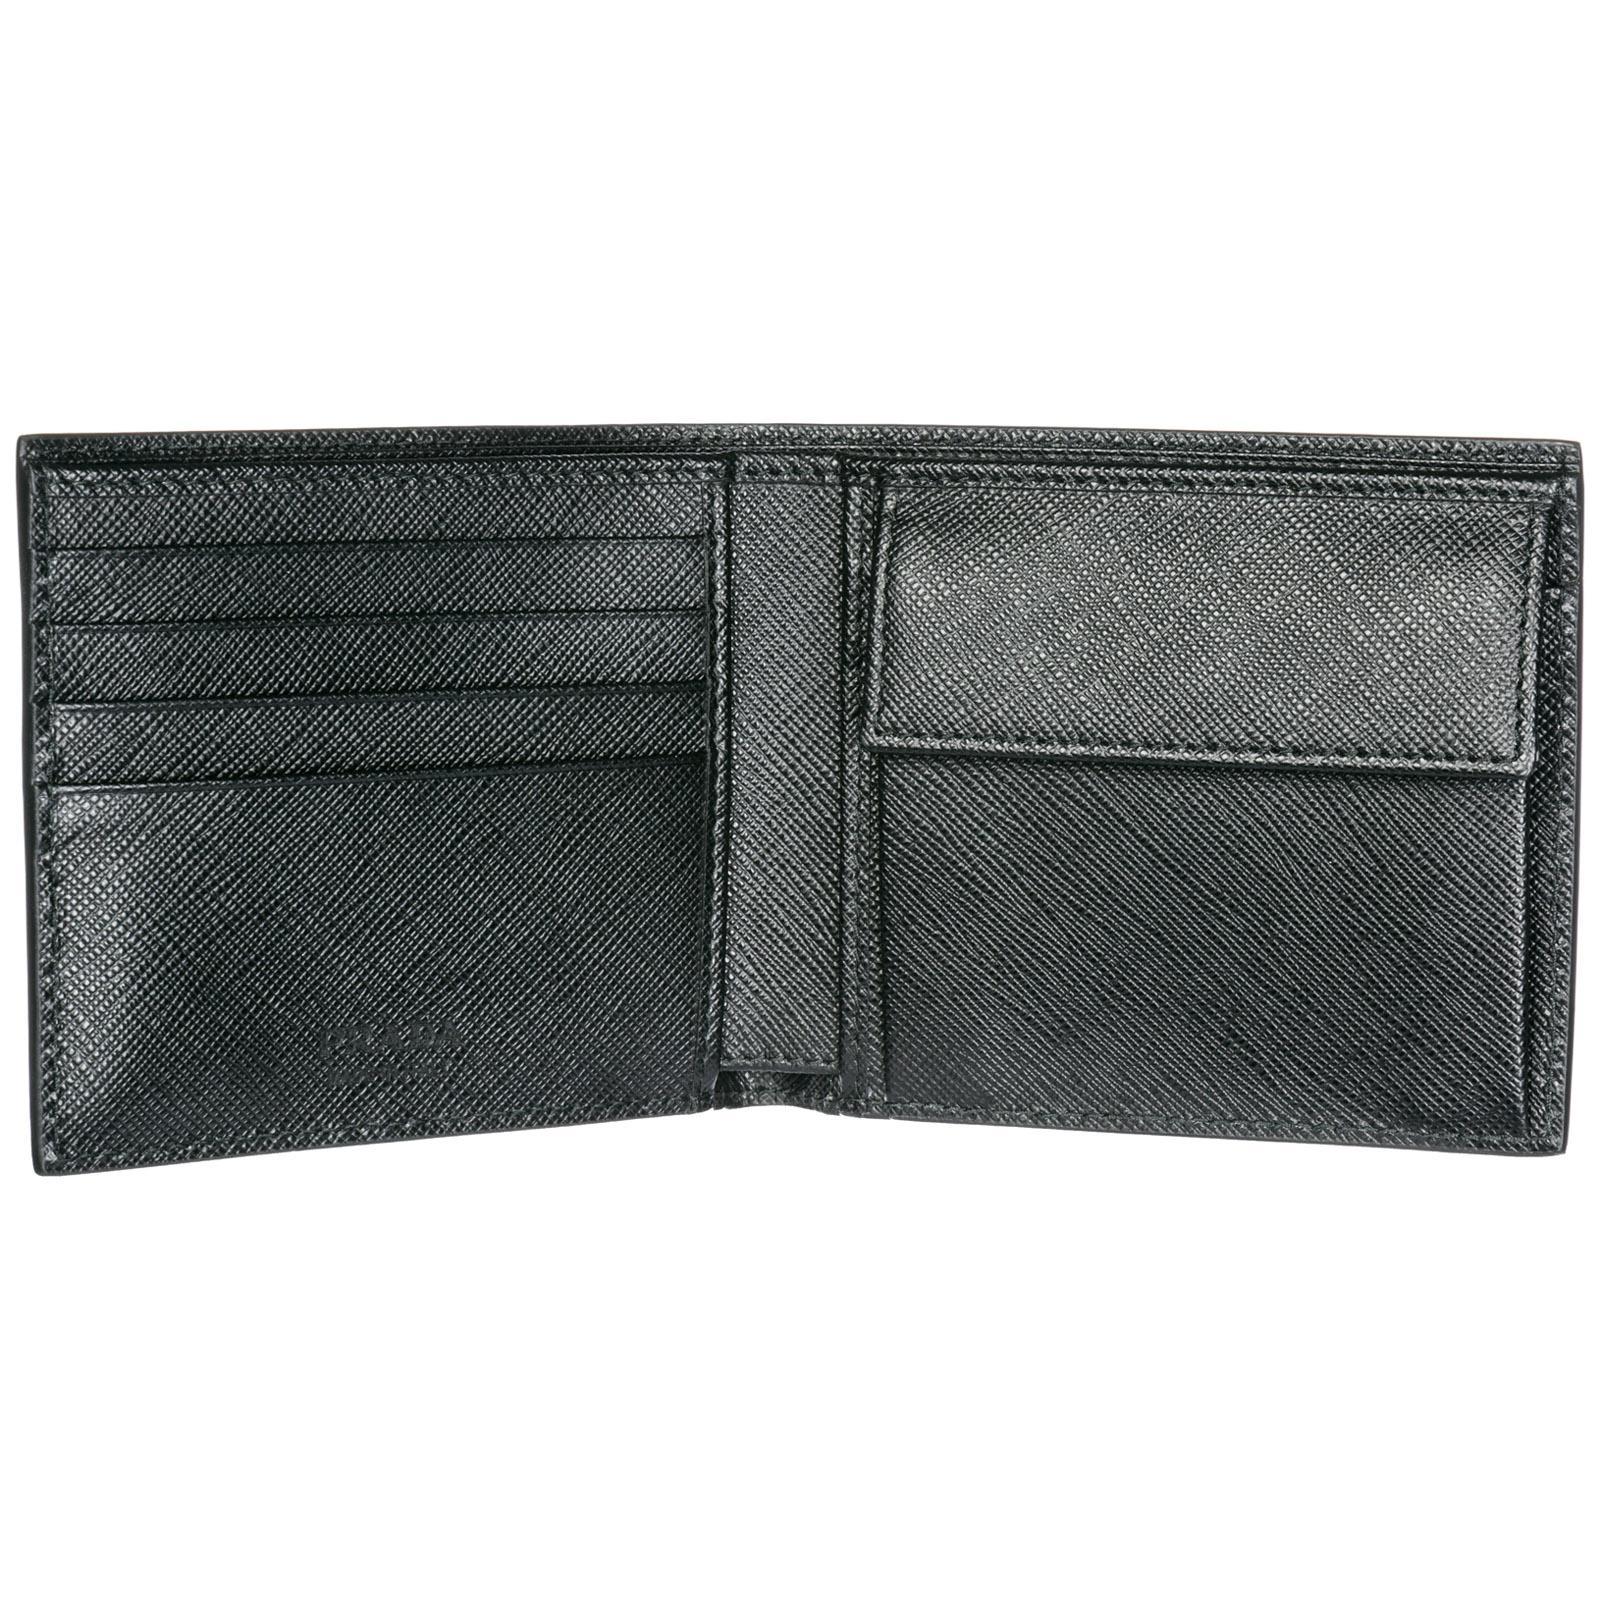 c5a1150c3bcf ... Men's wallet genuine leather coin case holder purse card bifold ...